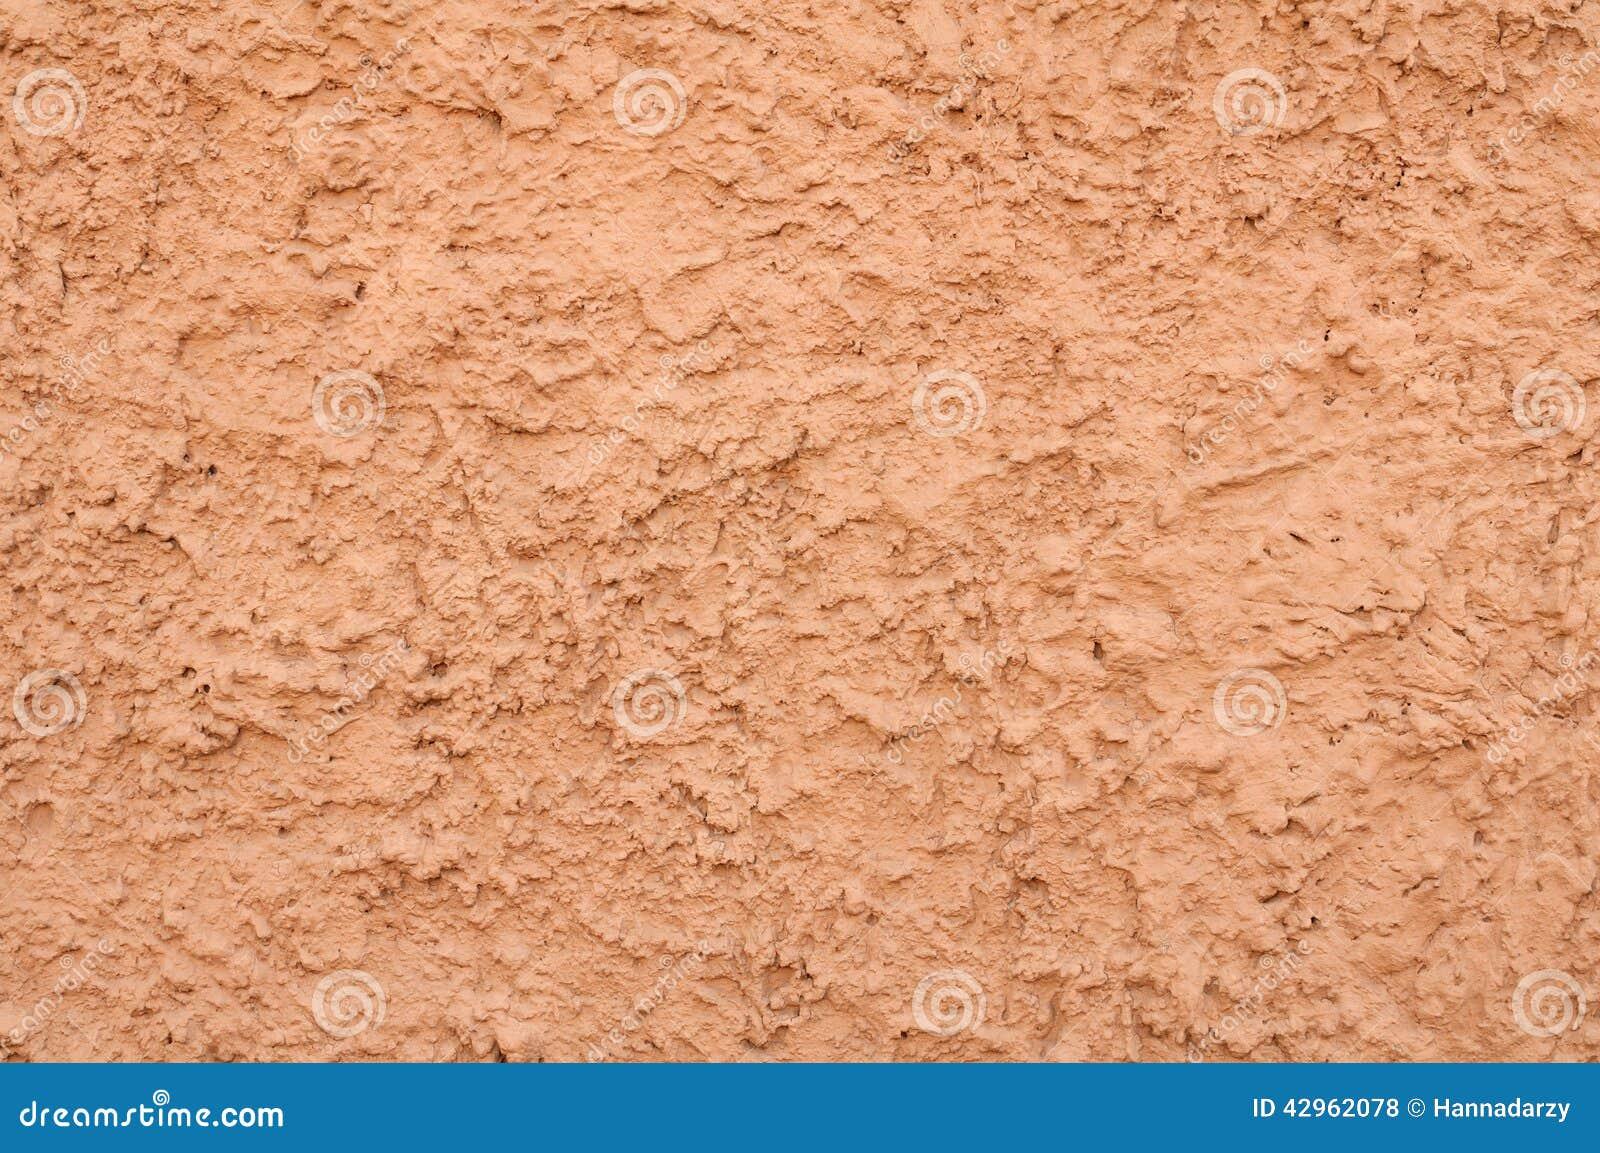 texture de mur couverte de stuc rose photo stock image 42962078. Black Bedroom Furniture Sets. Home Design Ideas